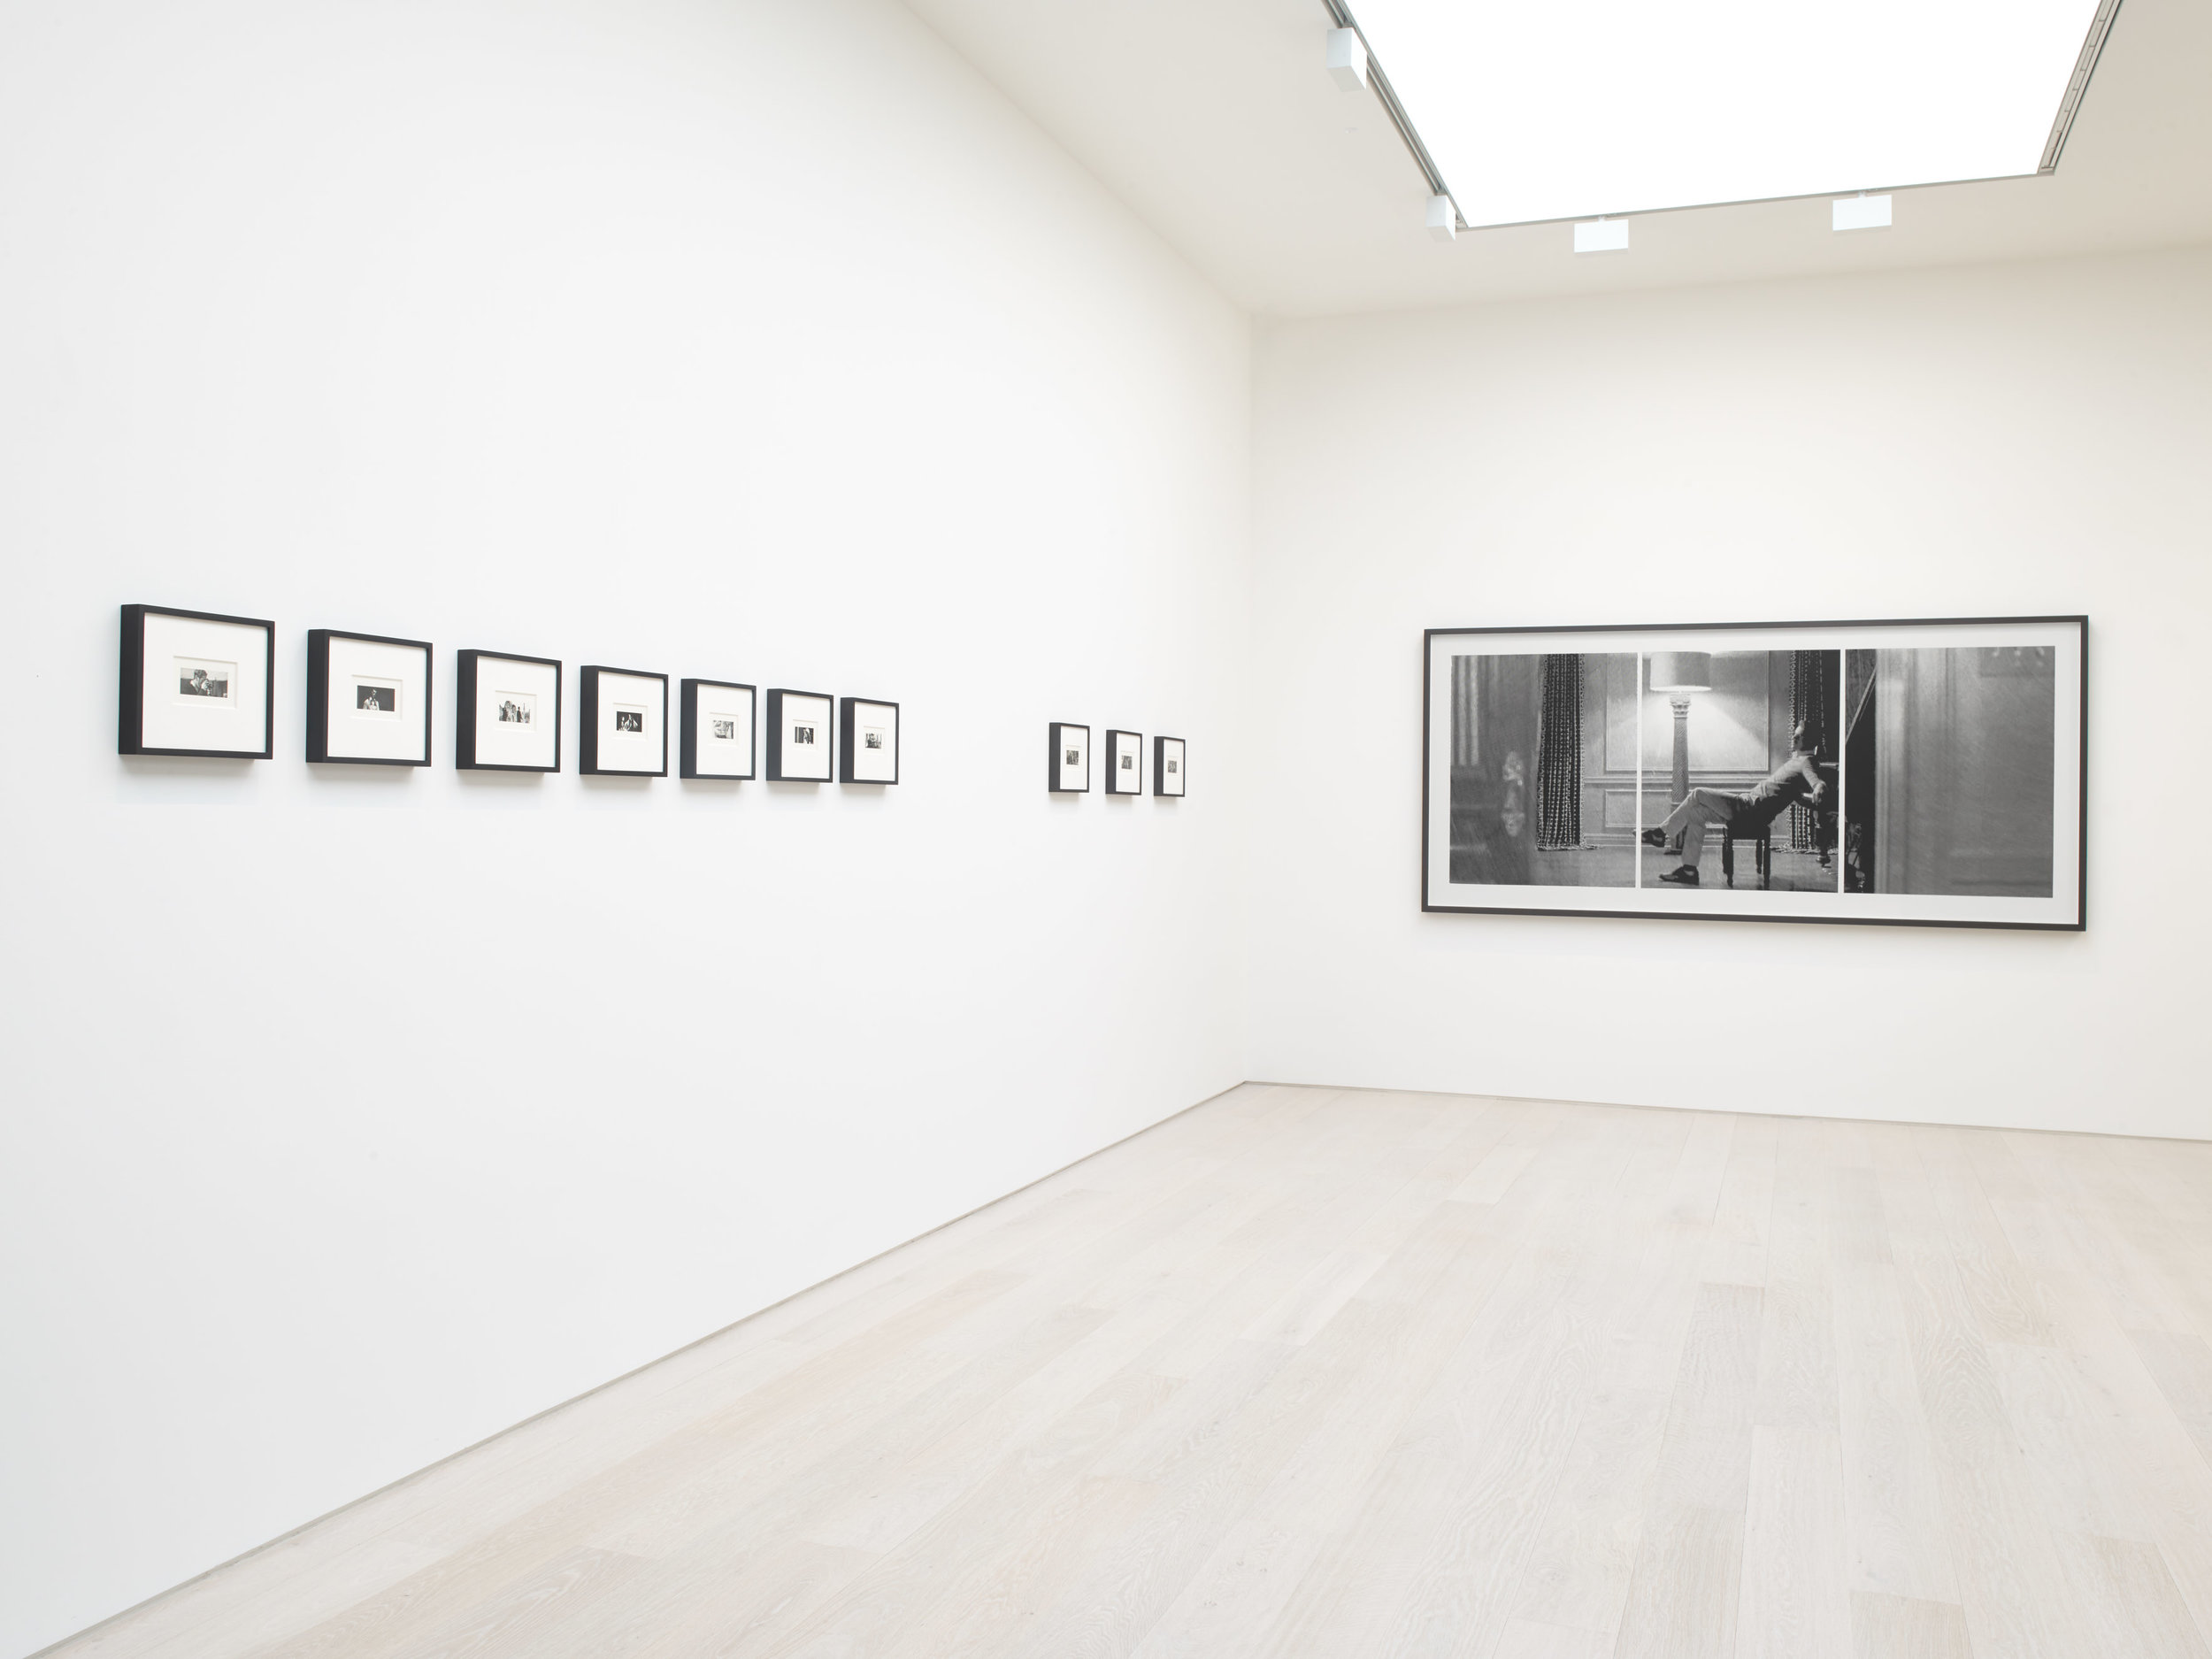 Marie Harnett_Still_Alan Cristea Gallery 2017 installation. Photo Stephe...-8.jpg